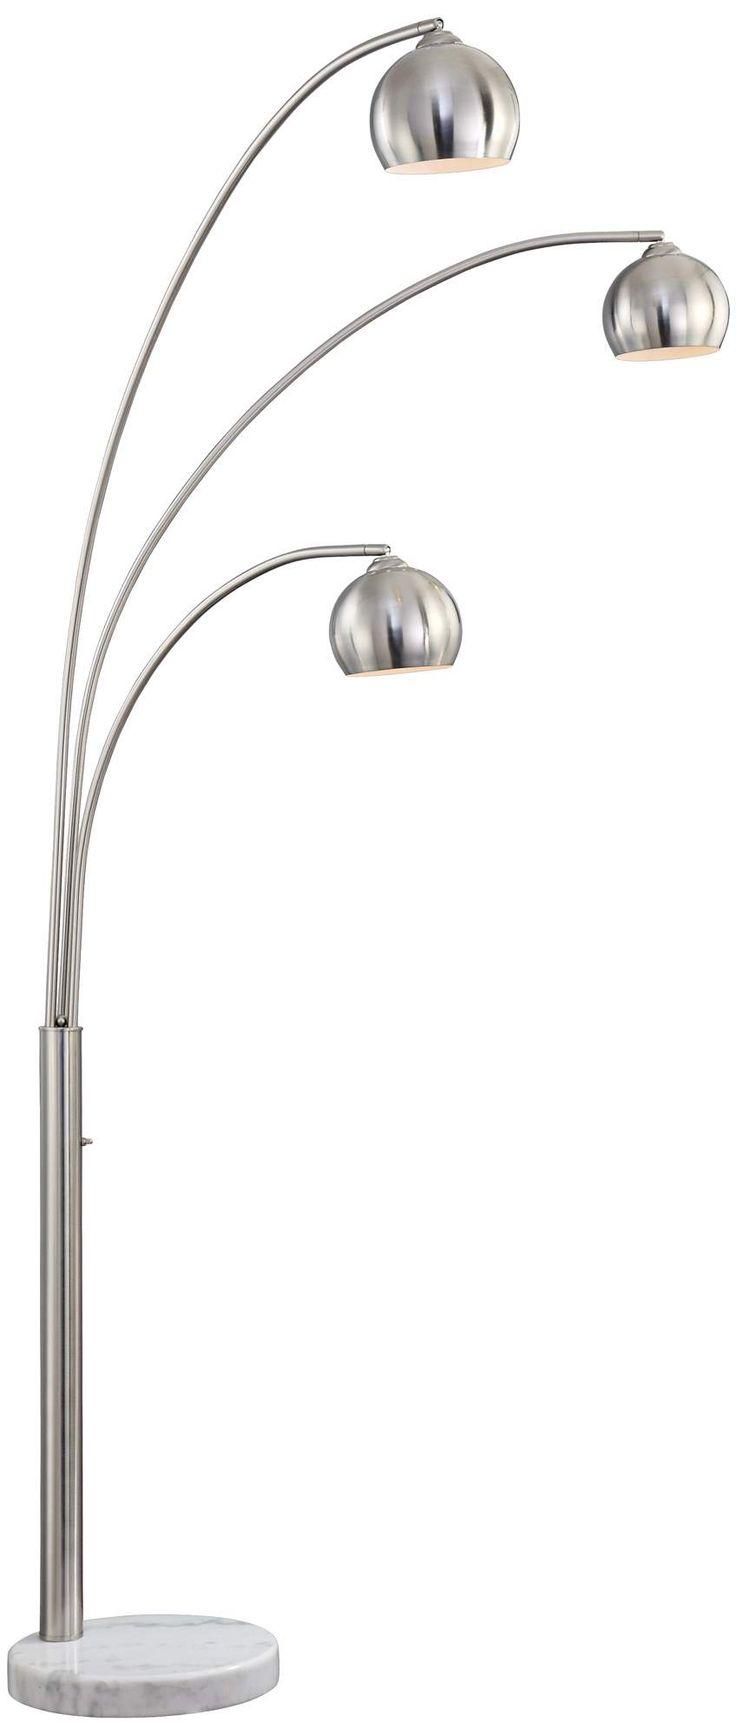 Threshold torchiere floor lamp textured bronze 65 - Crosstown 3 Light Arc Floor Lamp Style P9458